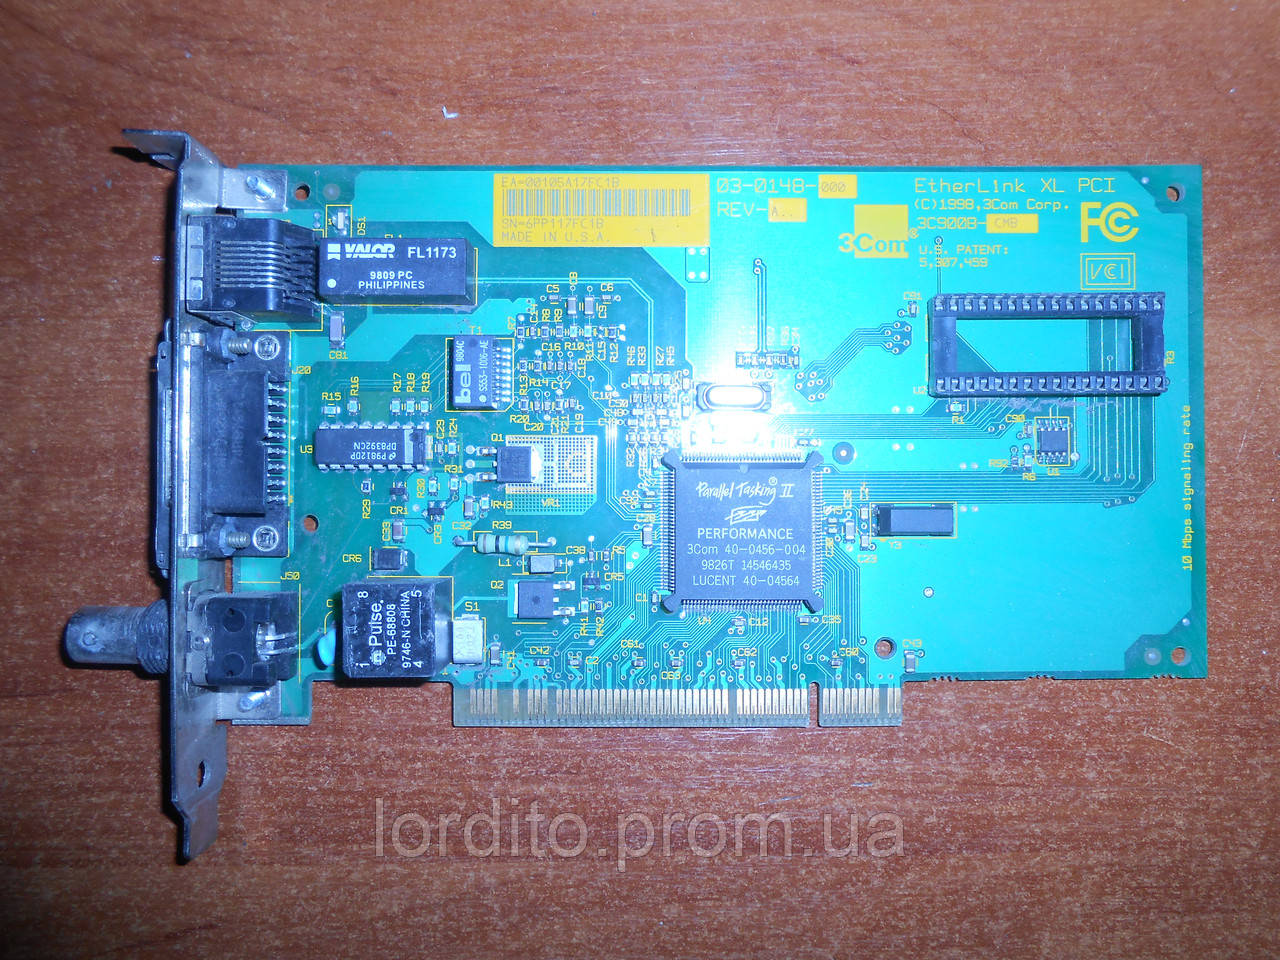 ETHERLINK XL PCI 3C900B DRIVER PC